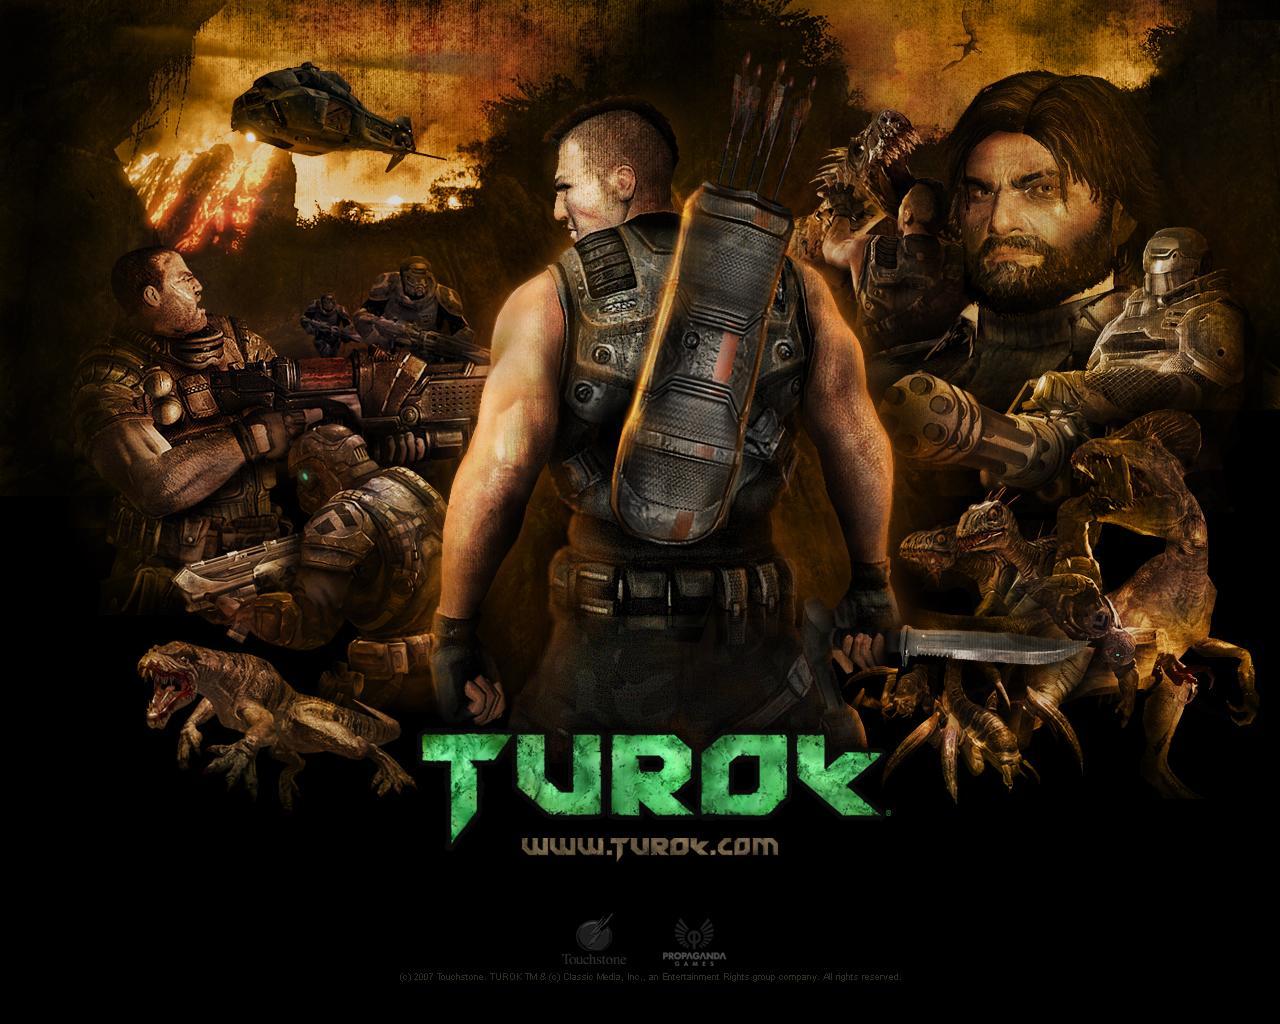 http://1.bp.blogspot.com/-e8cgN1ZY8Vs/TsunDhPMCgI/AAAAAAAAAB4/_rhUkJTtpVo/s1600/turok_wallpaper_1.jpg